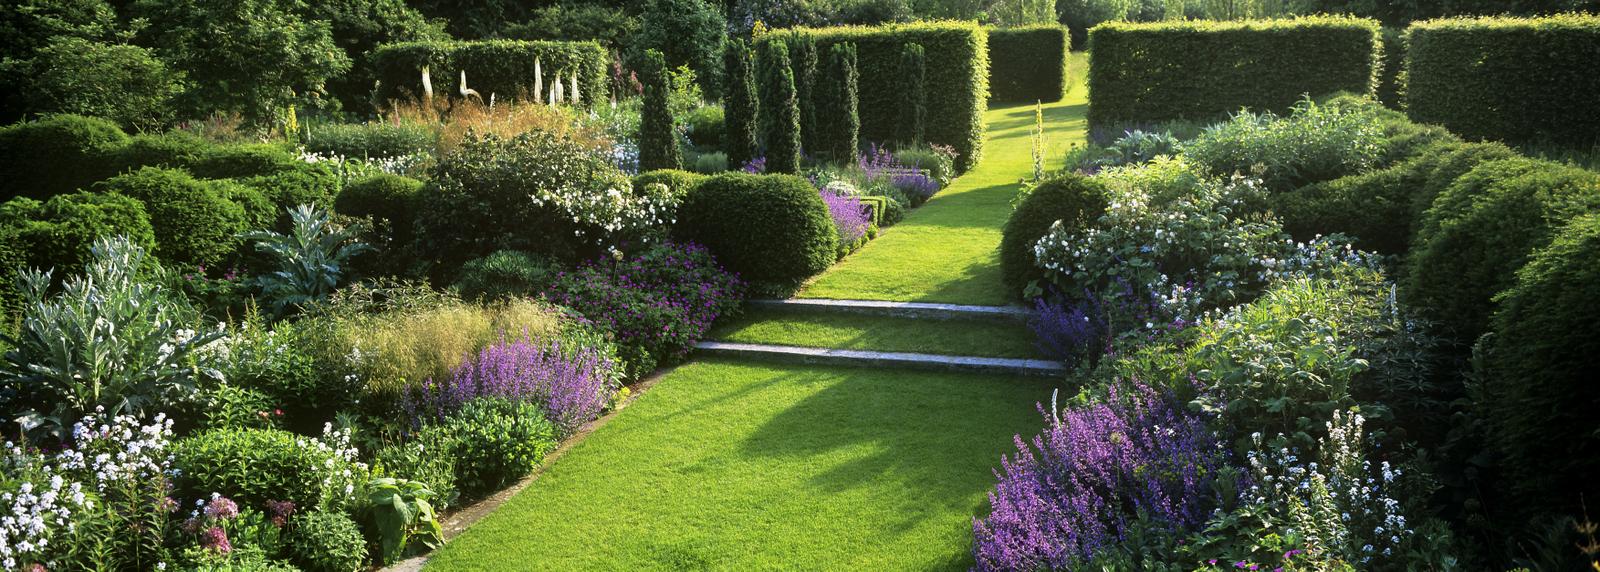 West Gardens Garden Ftempo